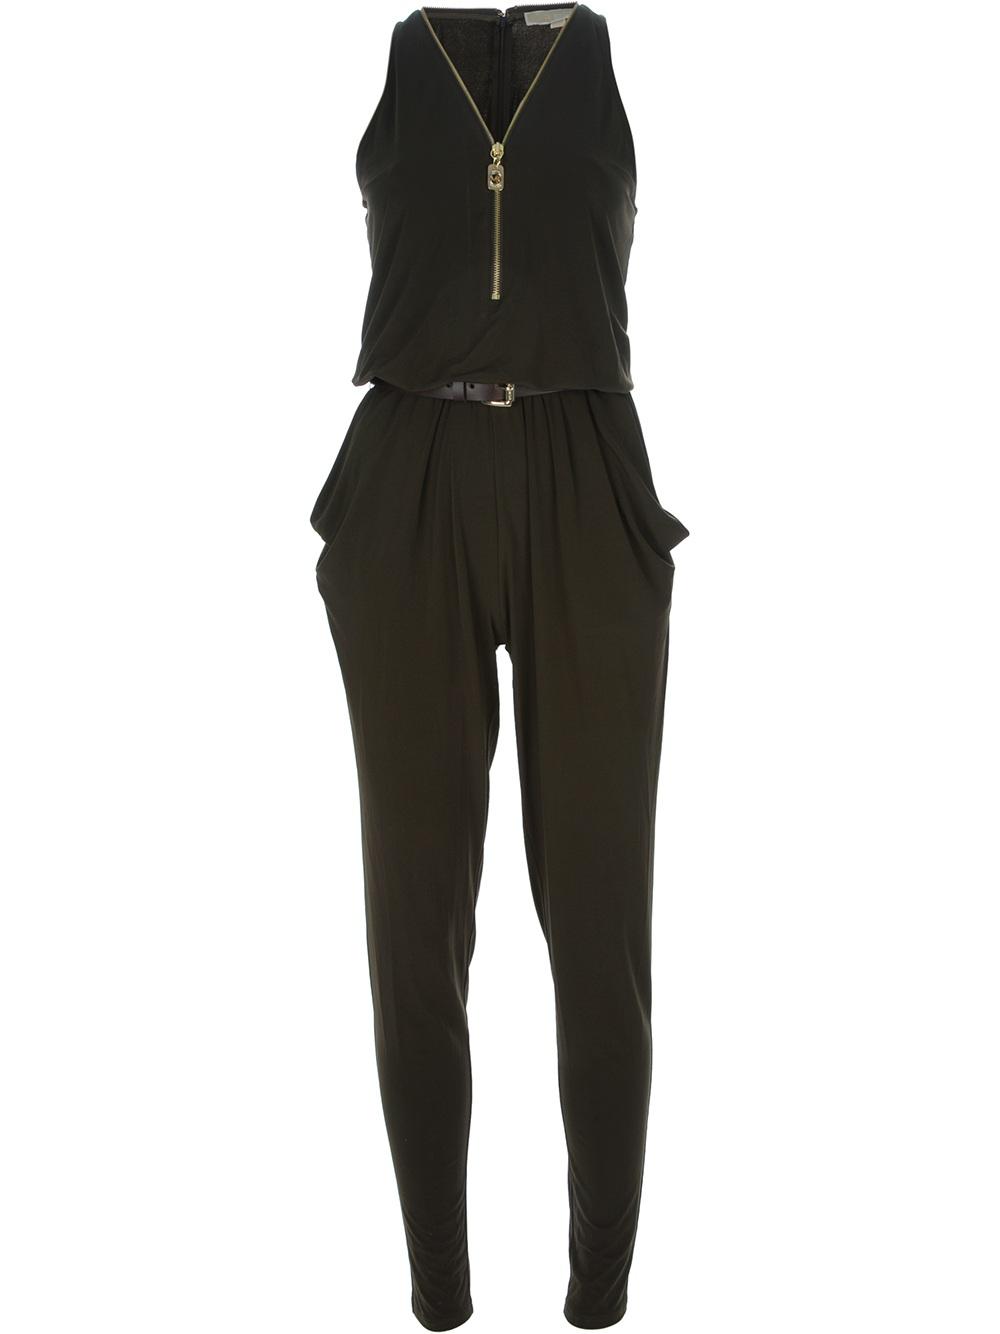 michael michael kors belted jumpsuit in green lyst. Black Bedroom Furniture Sets. Home Design Ideas